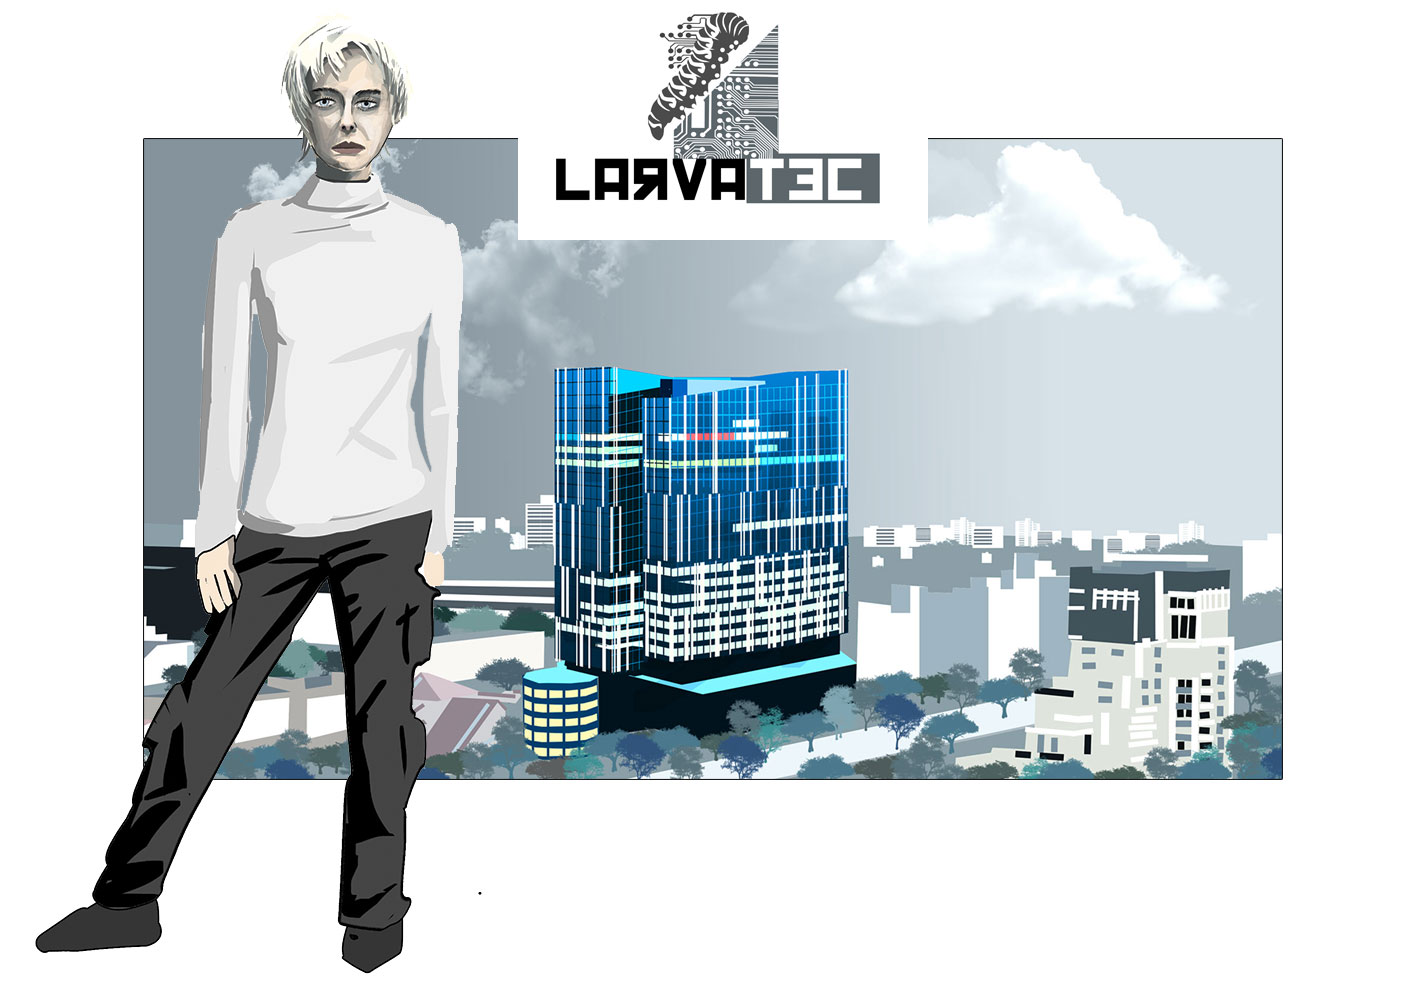 larvatech